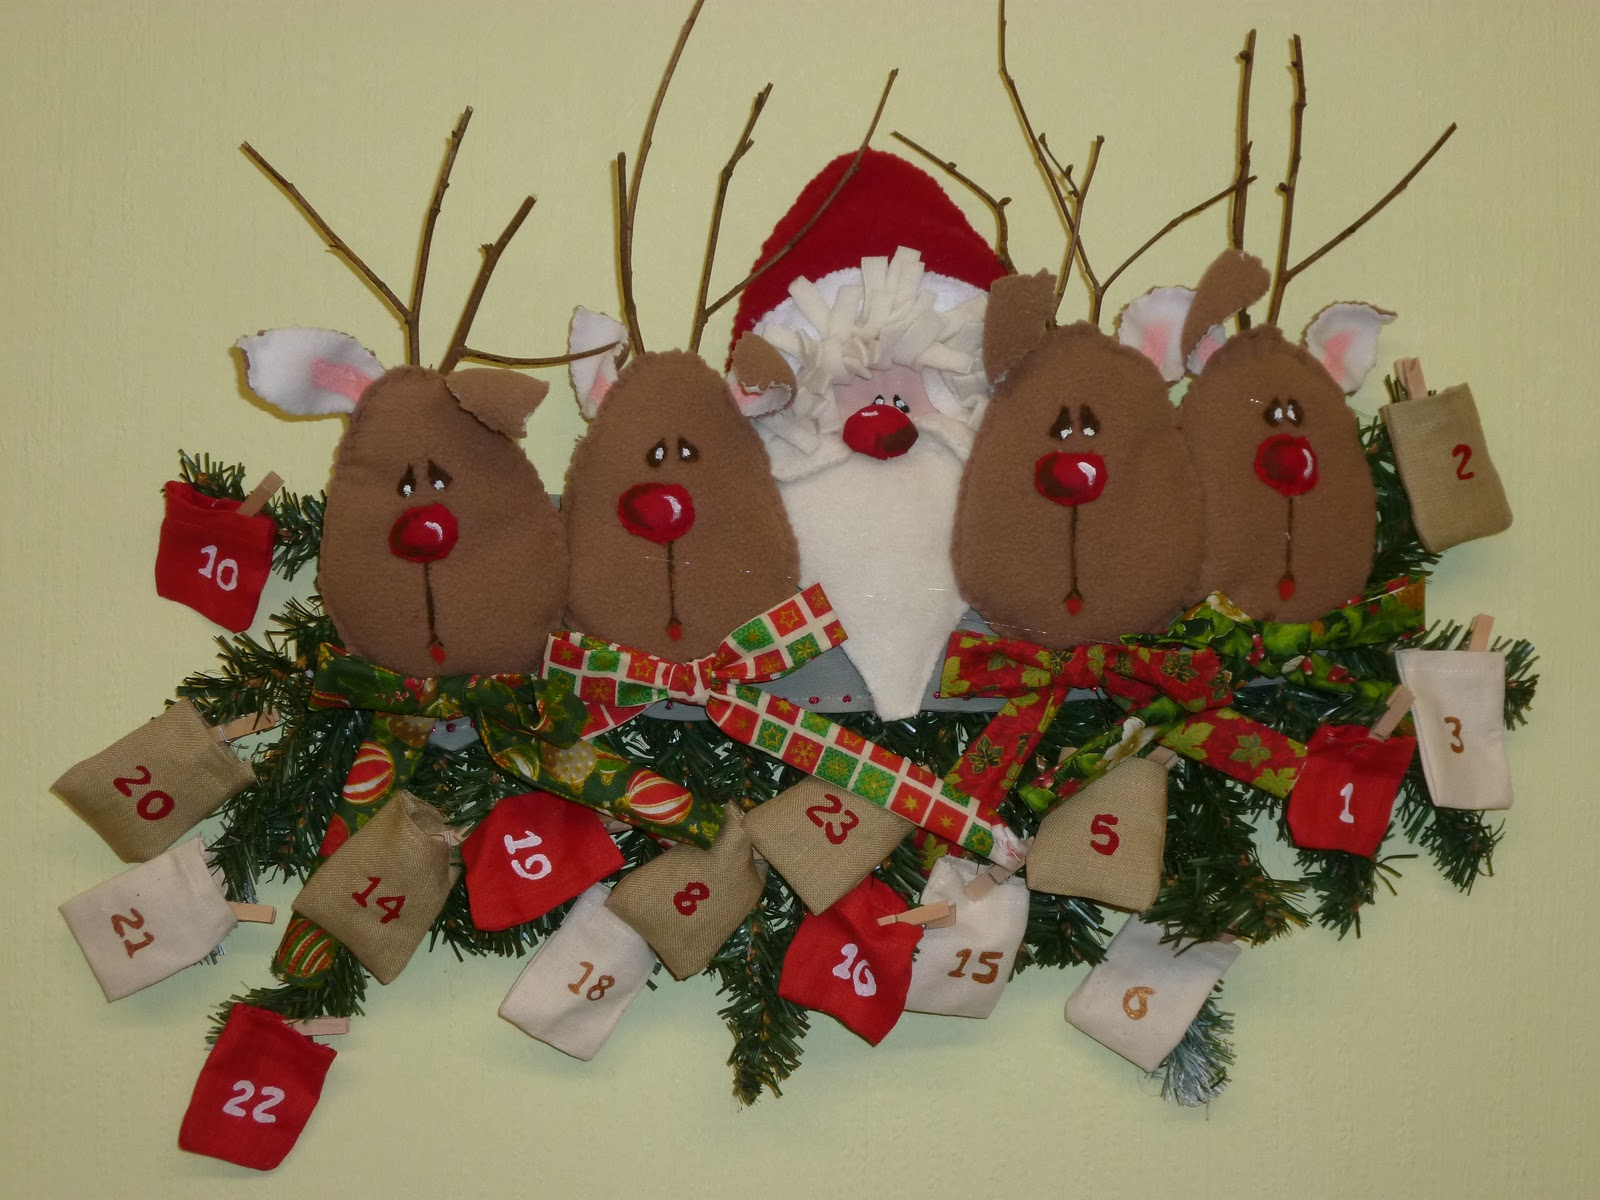 calendrier de lavent bricolage renne — experience conseil